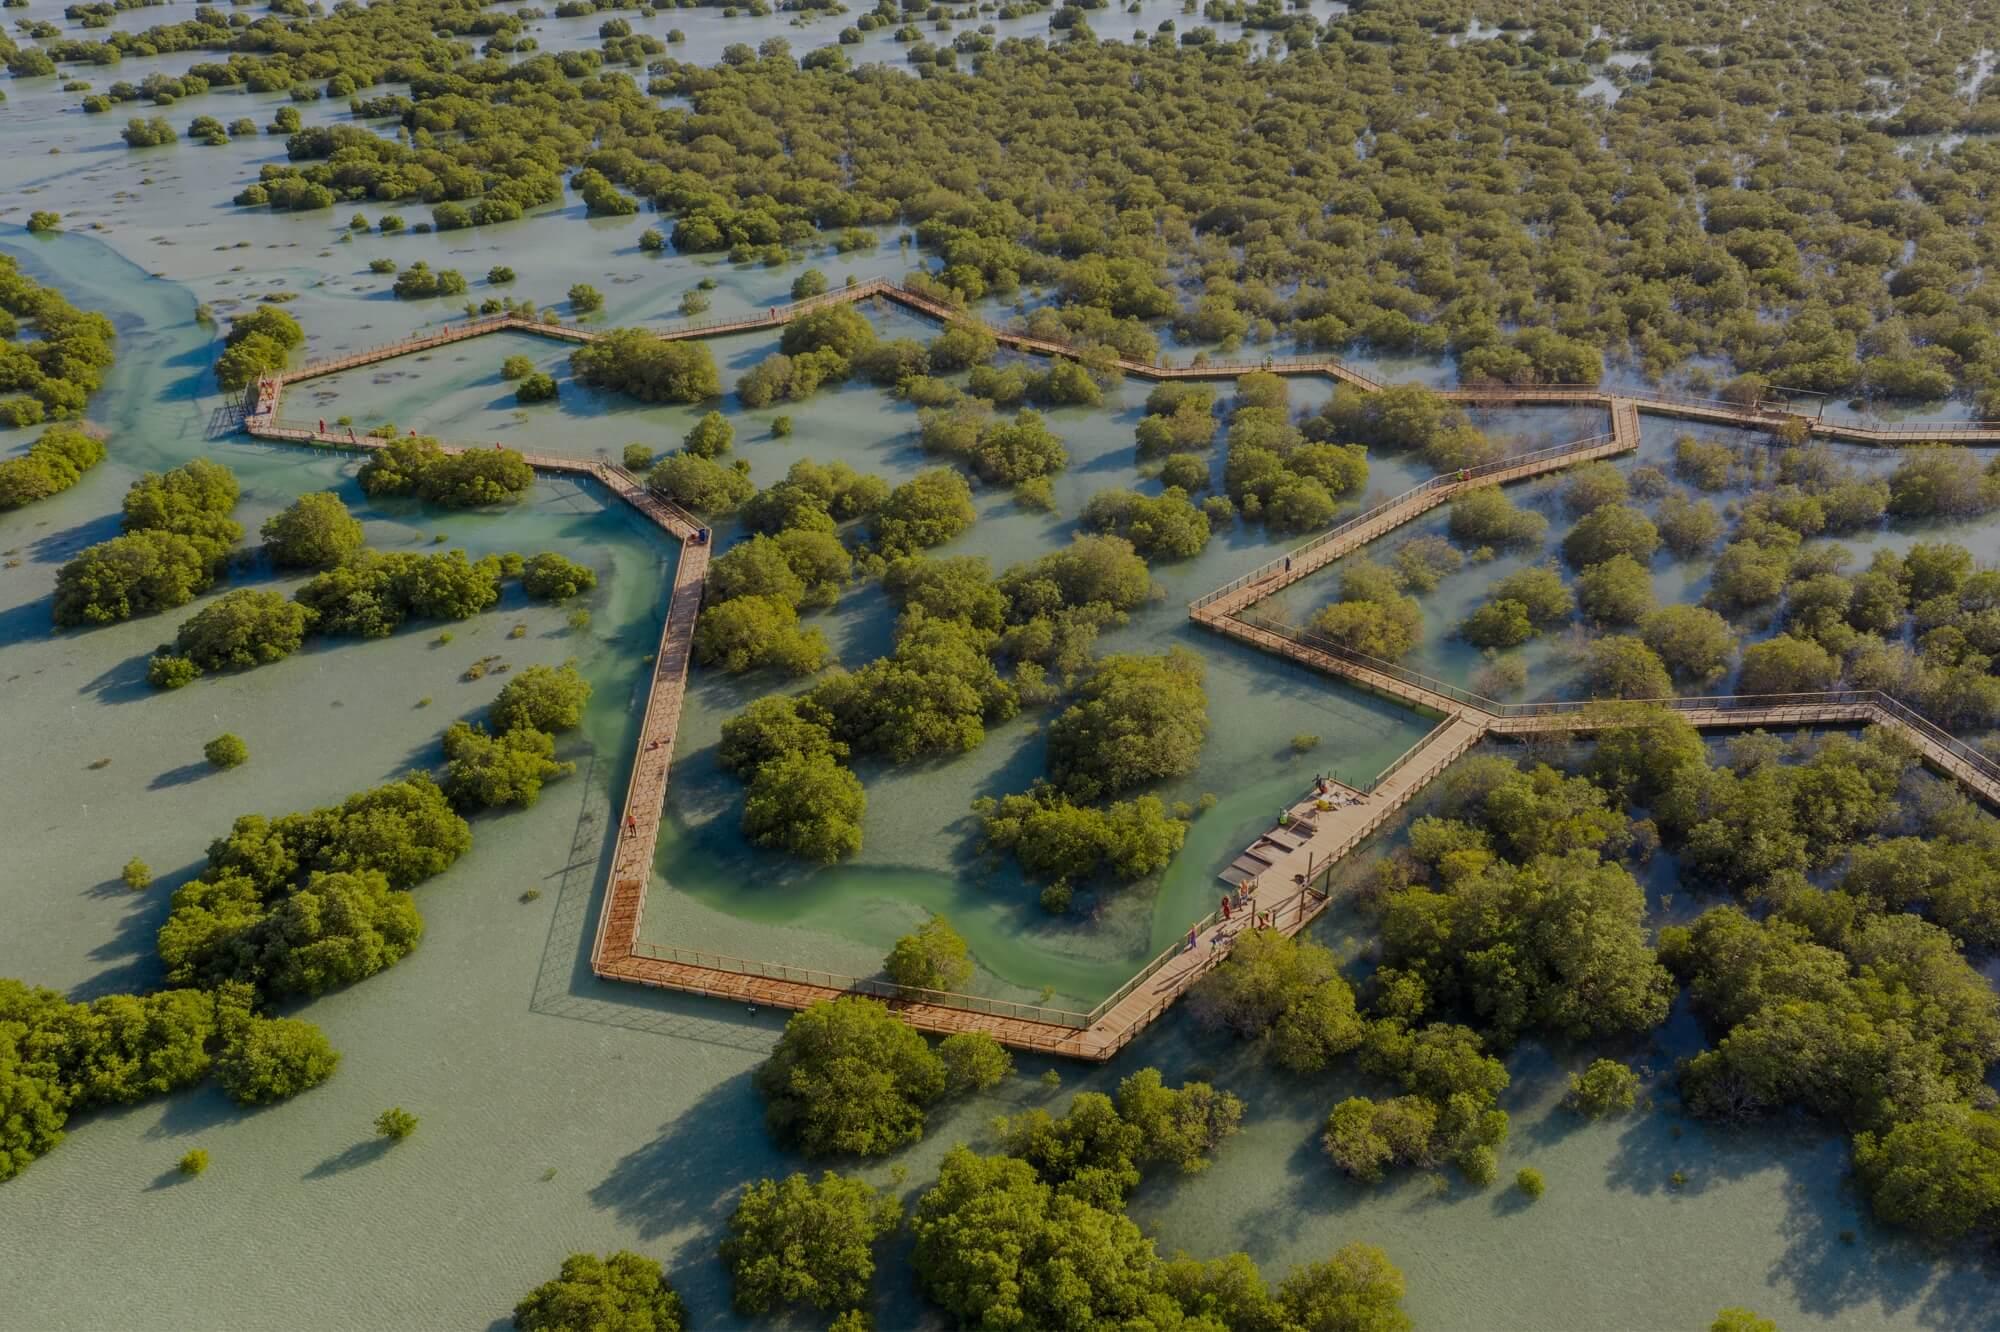 În Abu Dhabi a fost deschis un parc de mangrove   / excursie / imobil /